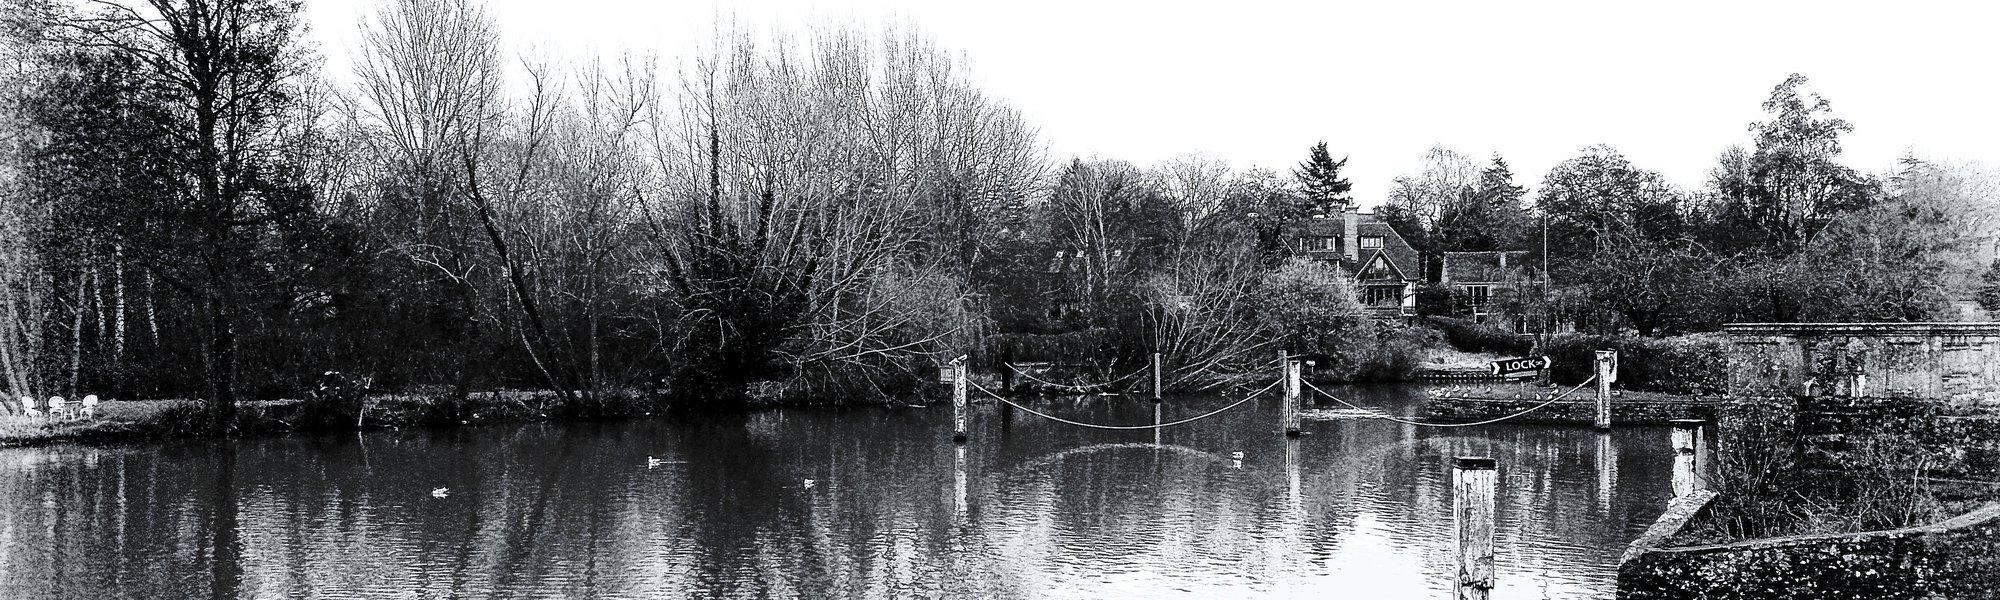 Iffley Lock